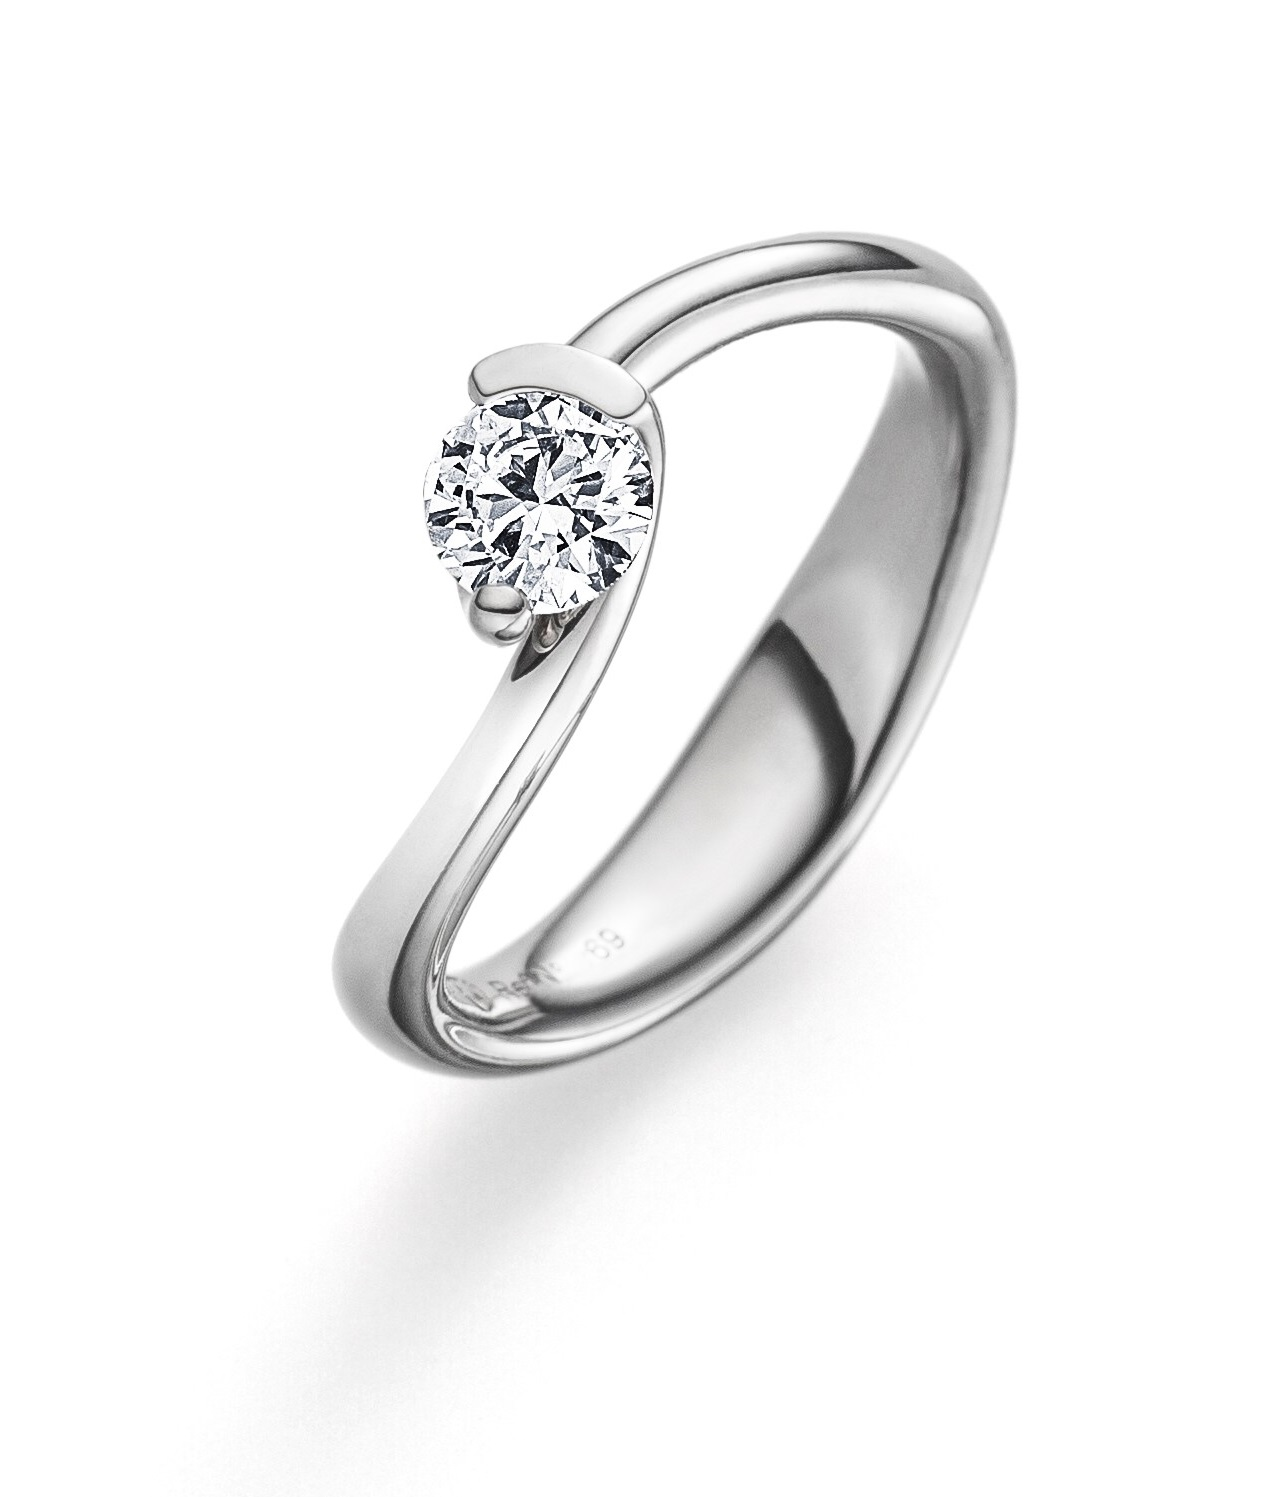 Design ring wit- of geelgoud